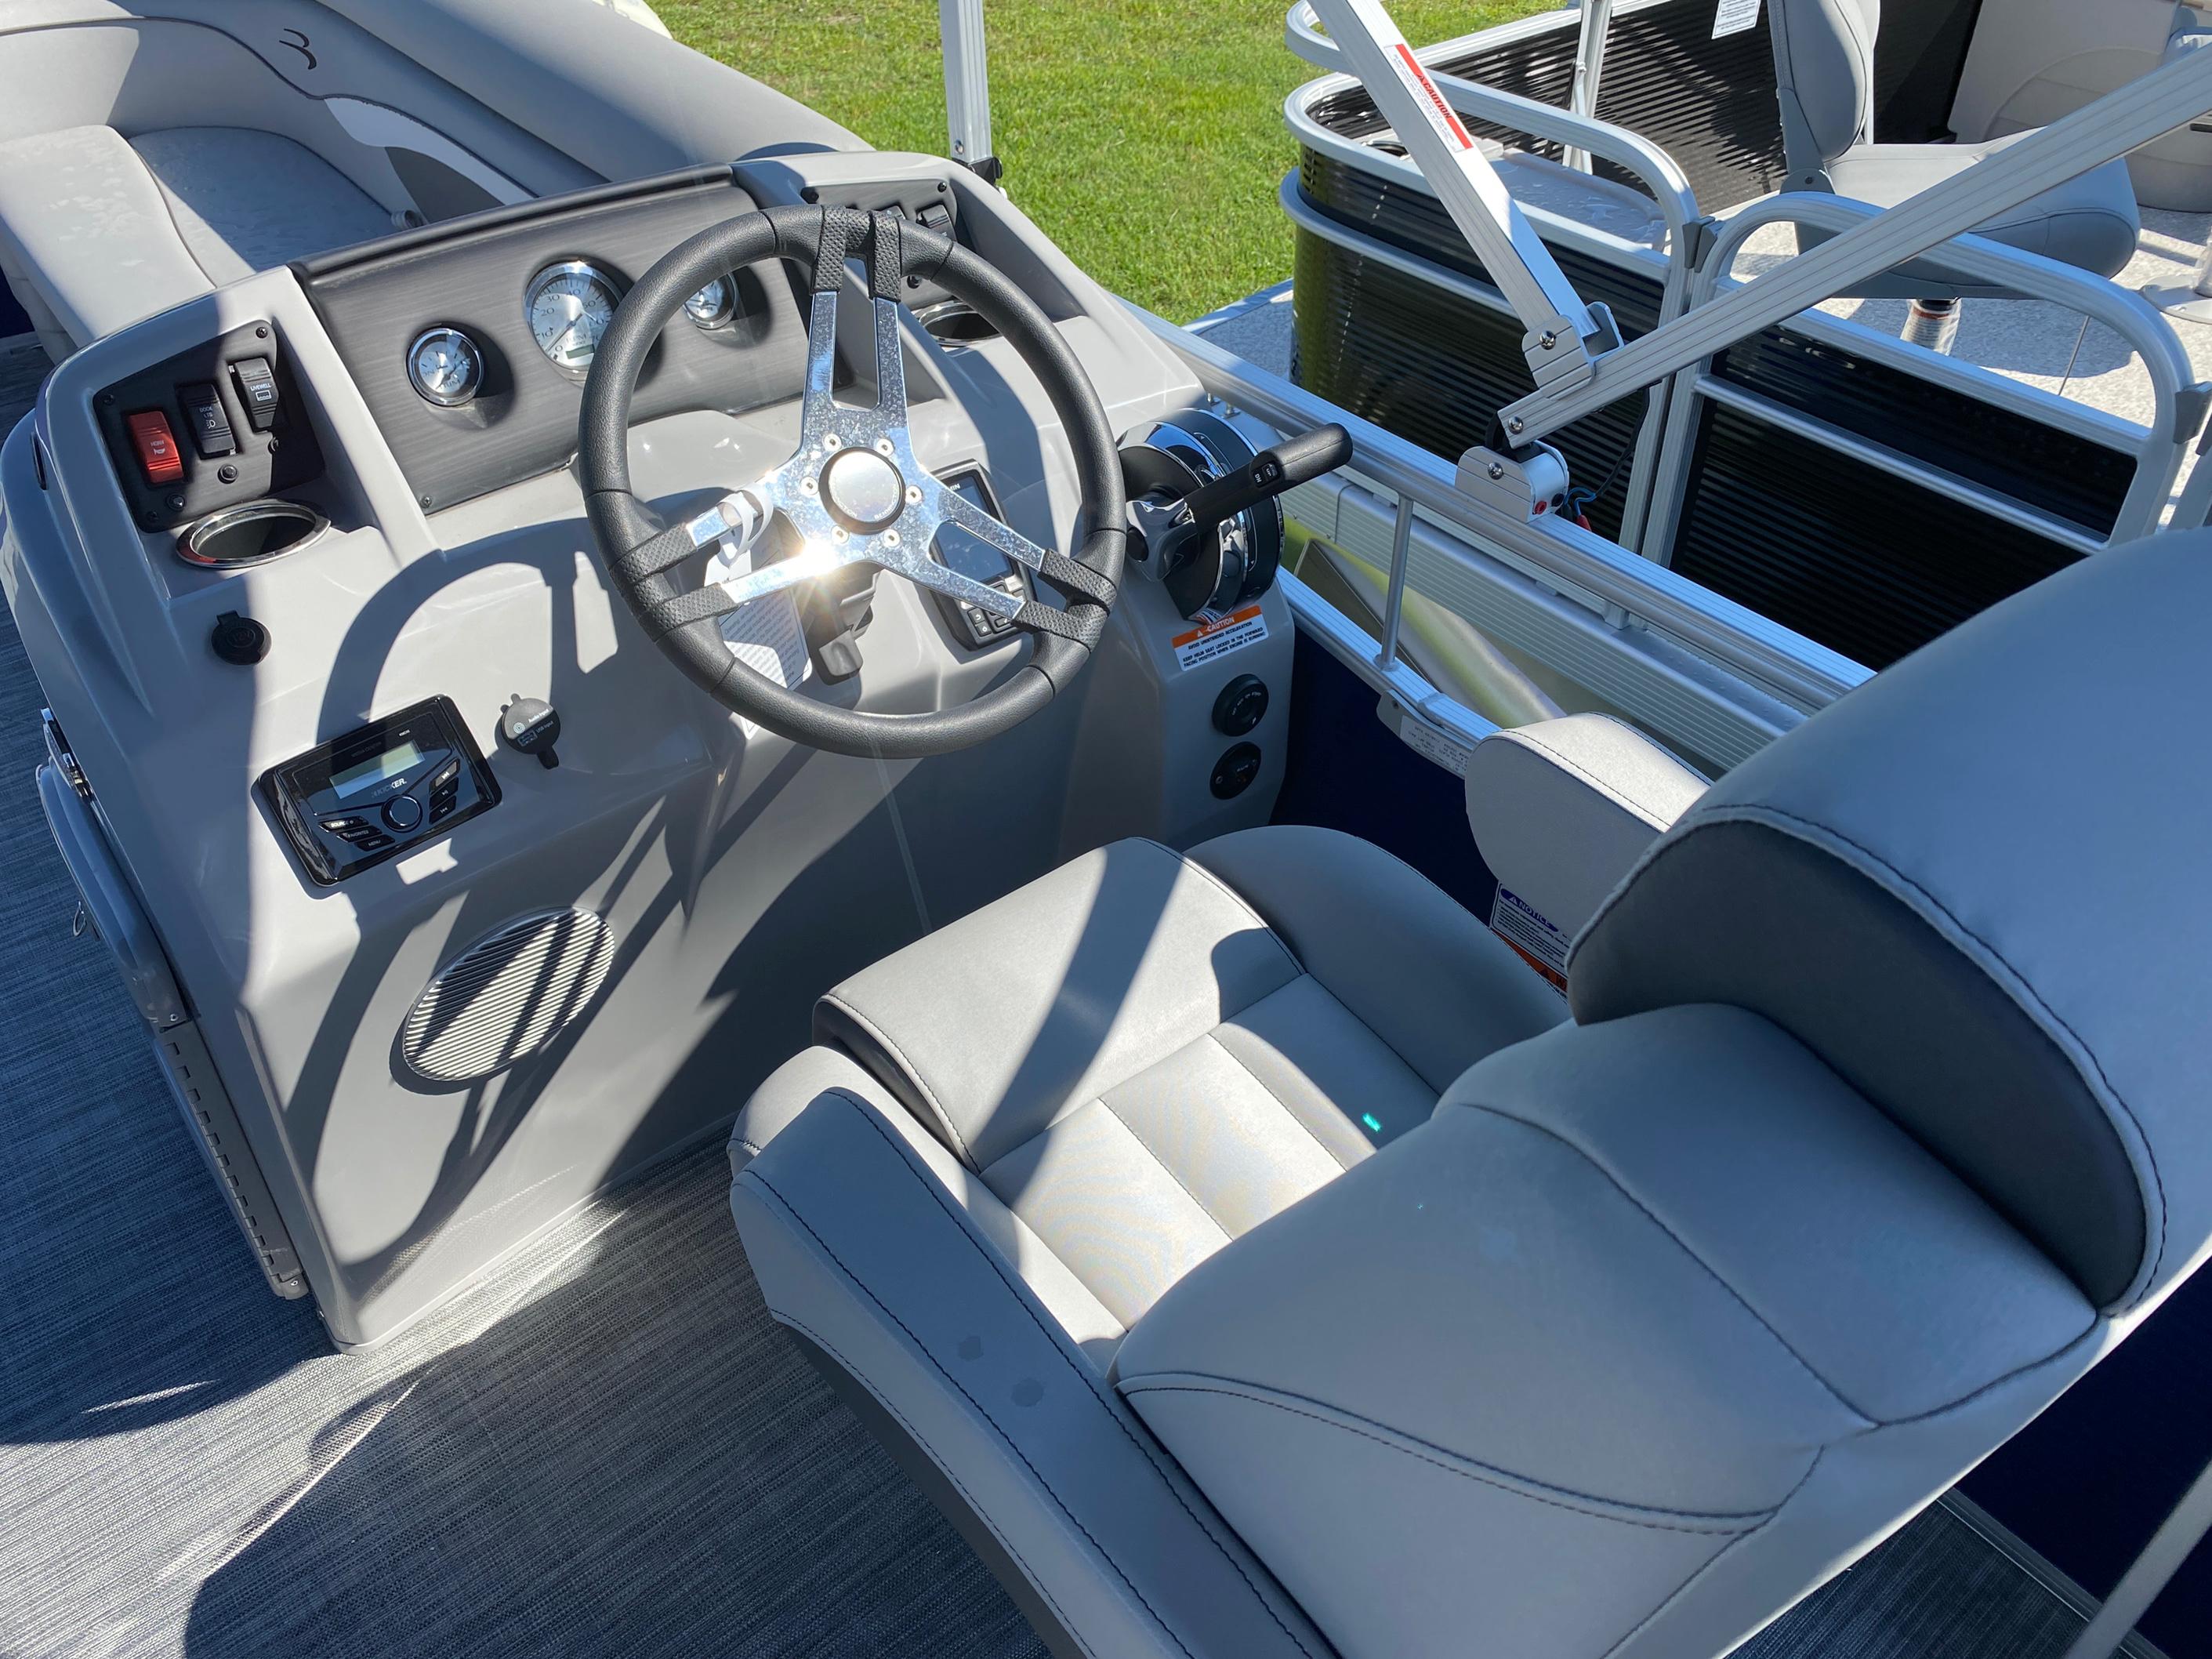 2021 Bennington boat for sale, model of the boat is 20 SVL & Image # 7 of 9